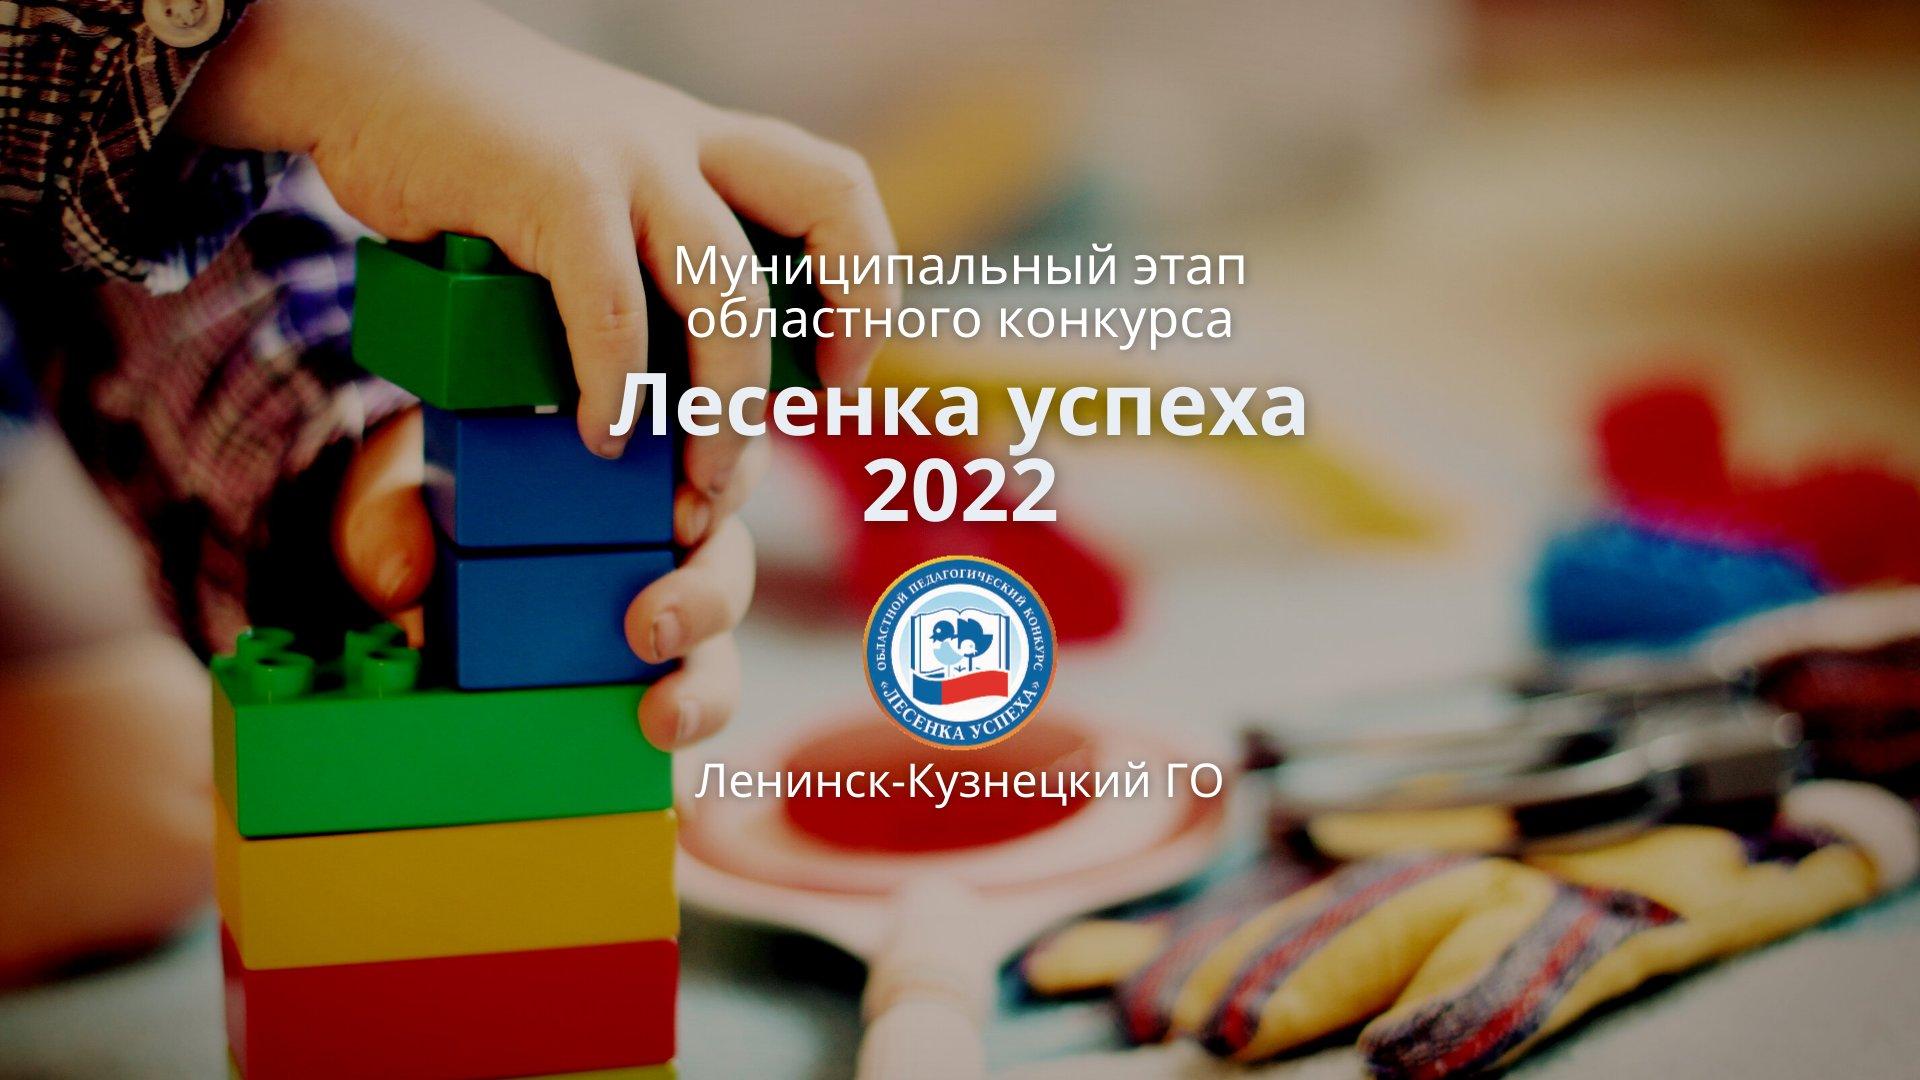 Лесенка успеха 2022